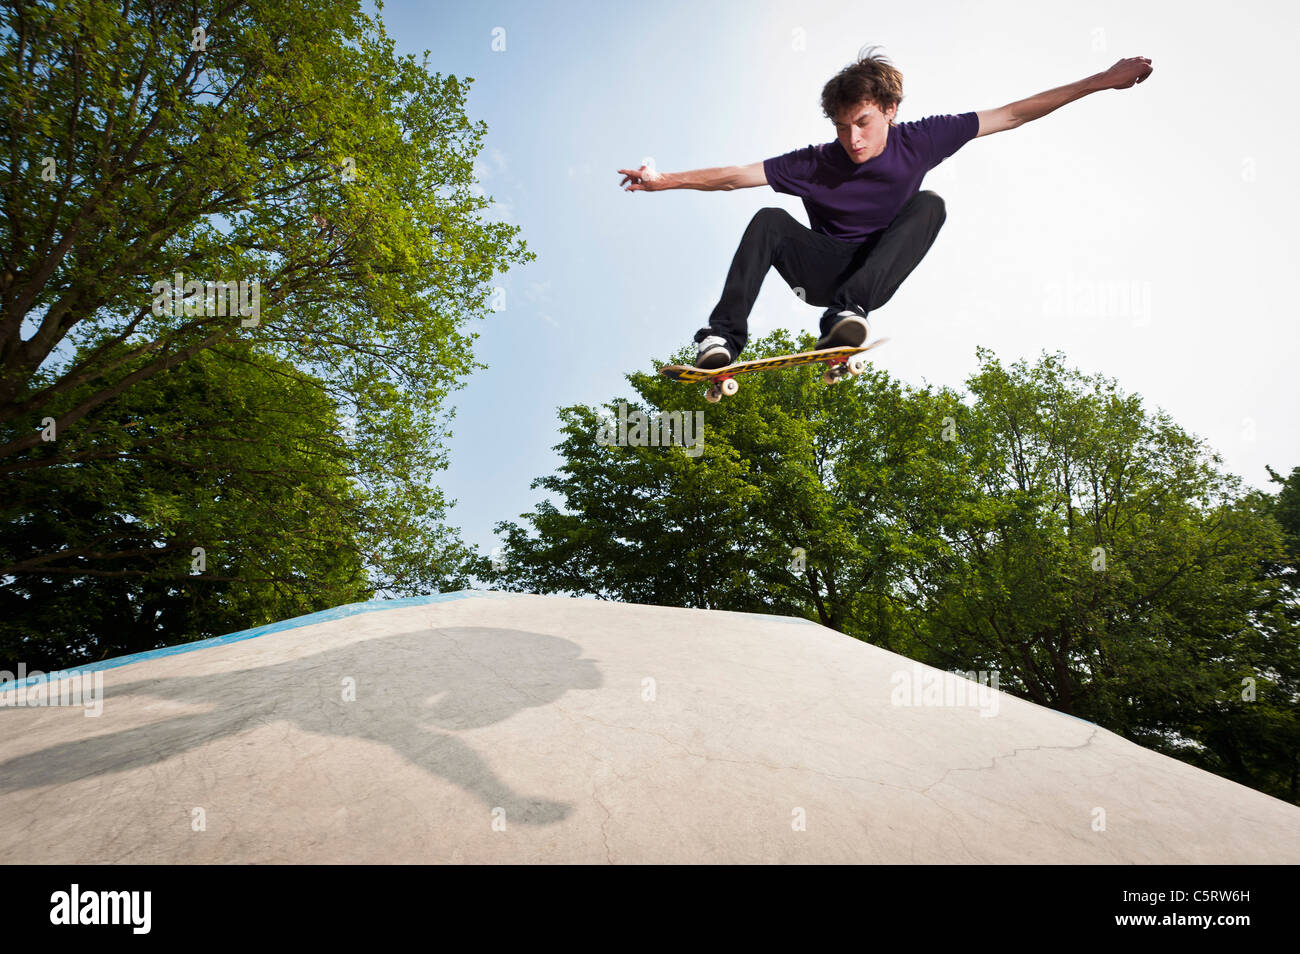 Germany, NRW, Duesseldorf, Man skateboarding at public skatepark - Stock Image